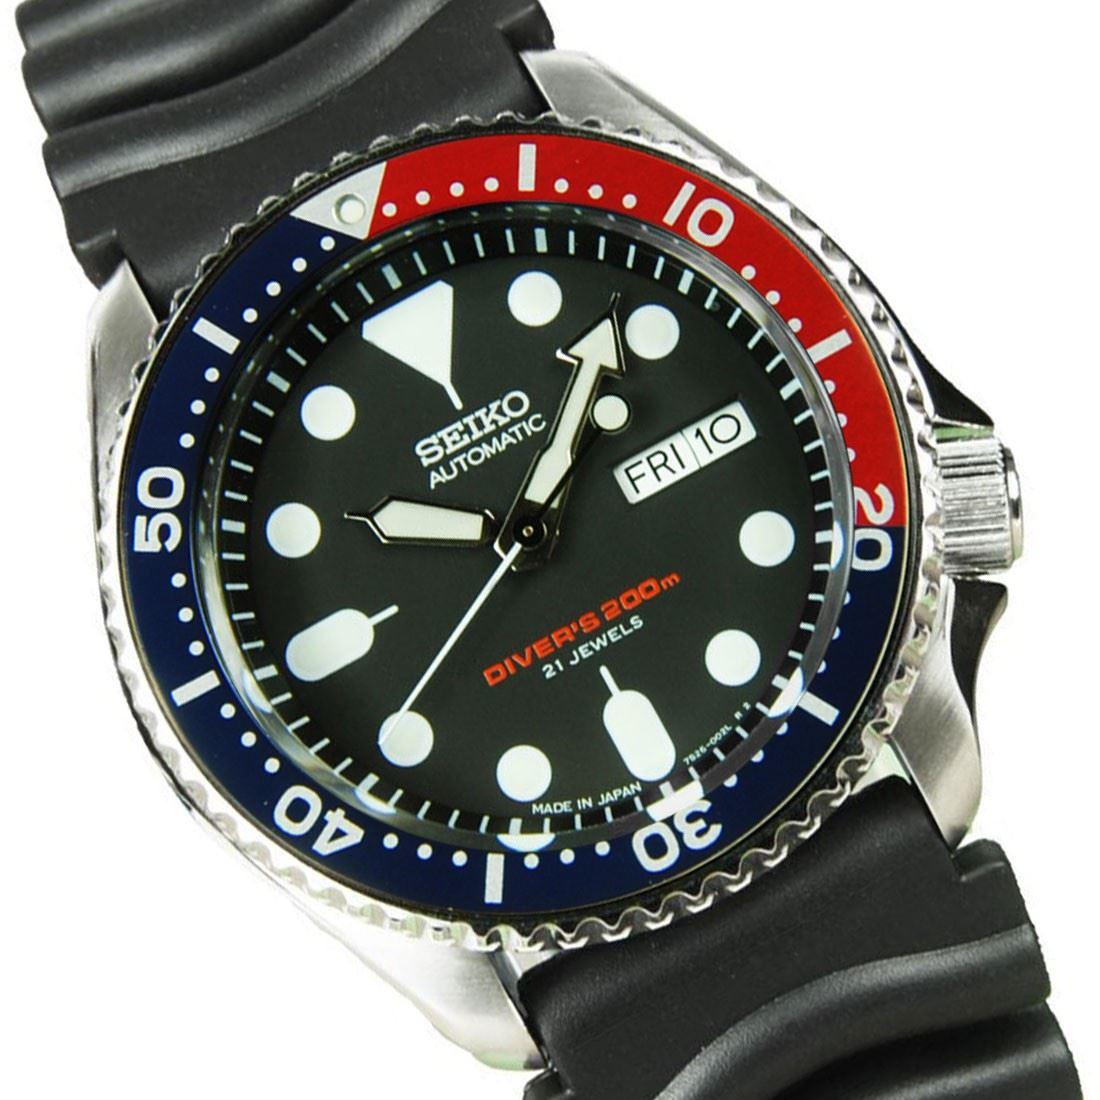 Seiko sk009j skx009k1 skx009j1 snzf15k1 divers watch ebay - Seiko dive watch history ...